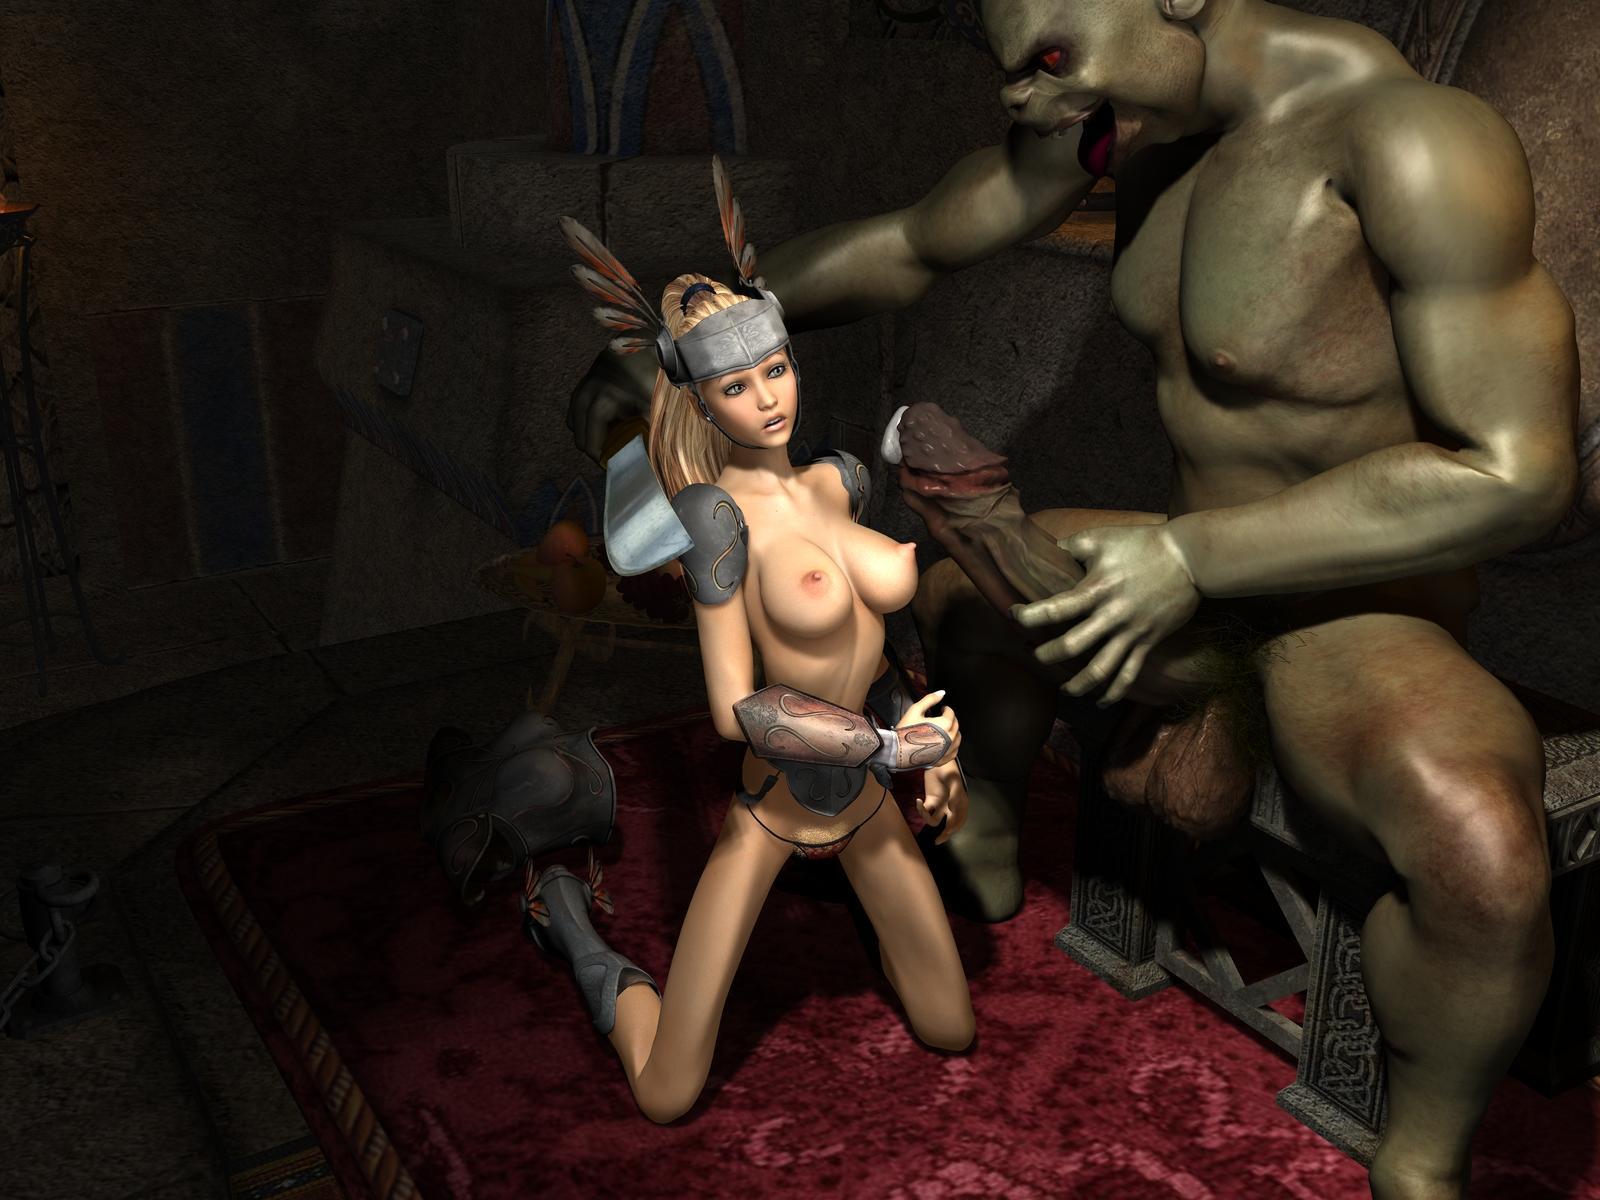 seks-igri-monstri